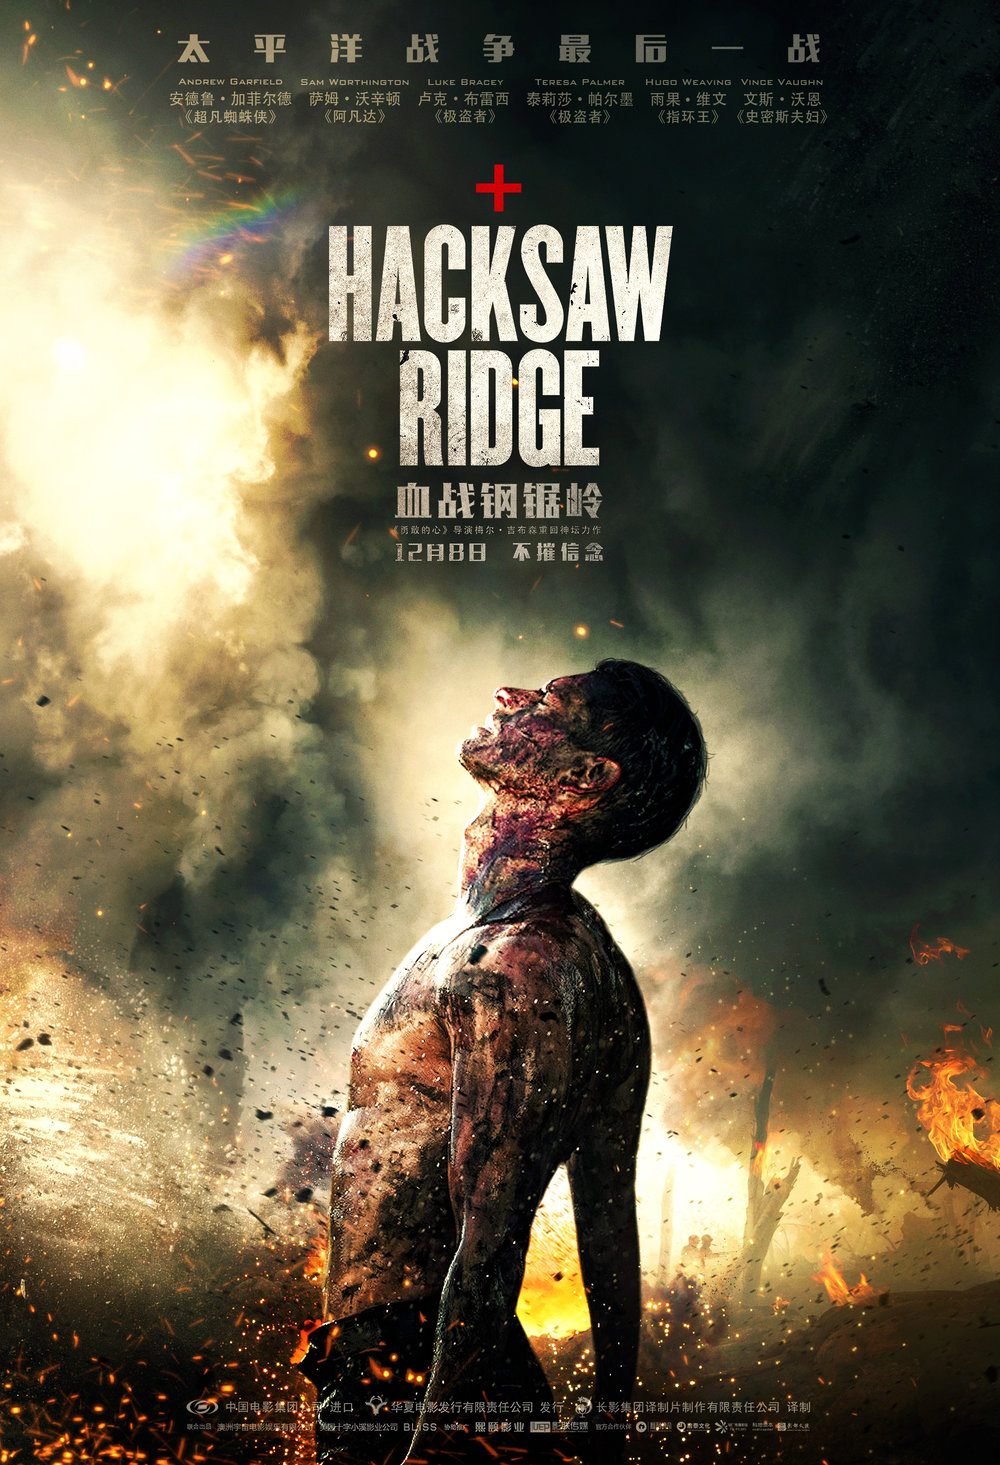 HACKSAW RIDGE - MOT CREATIVE.jpg